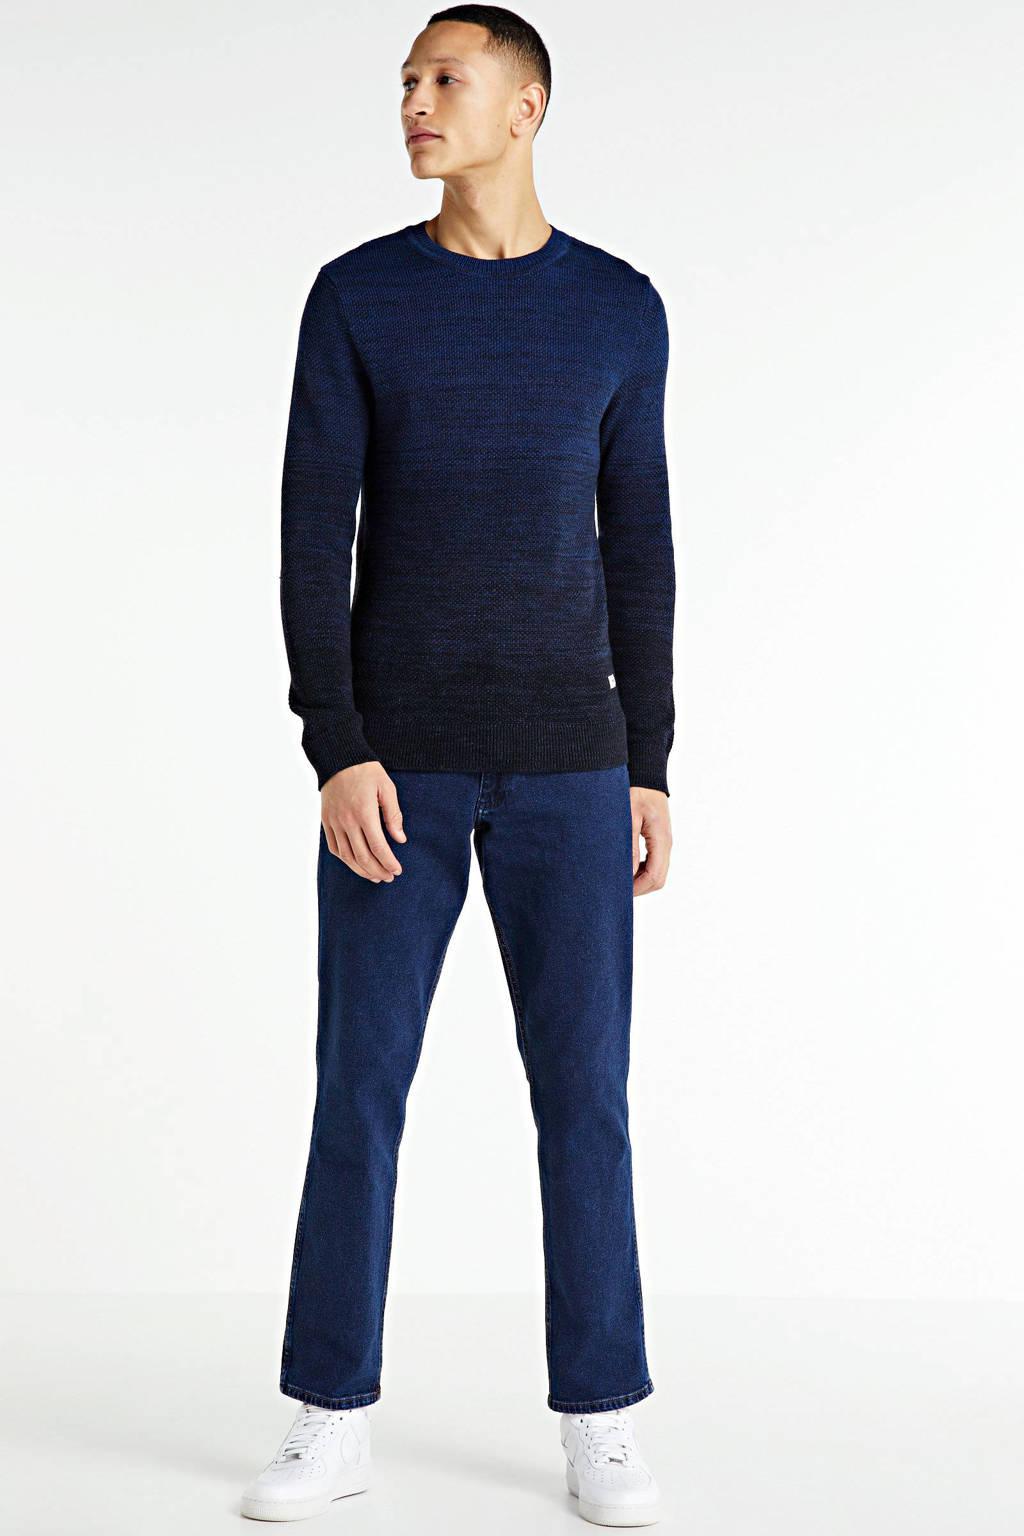 PRODUKT gemêleerde trui donkerblauw, Donkerblauw